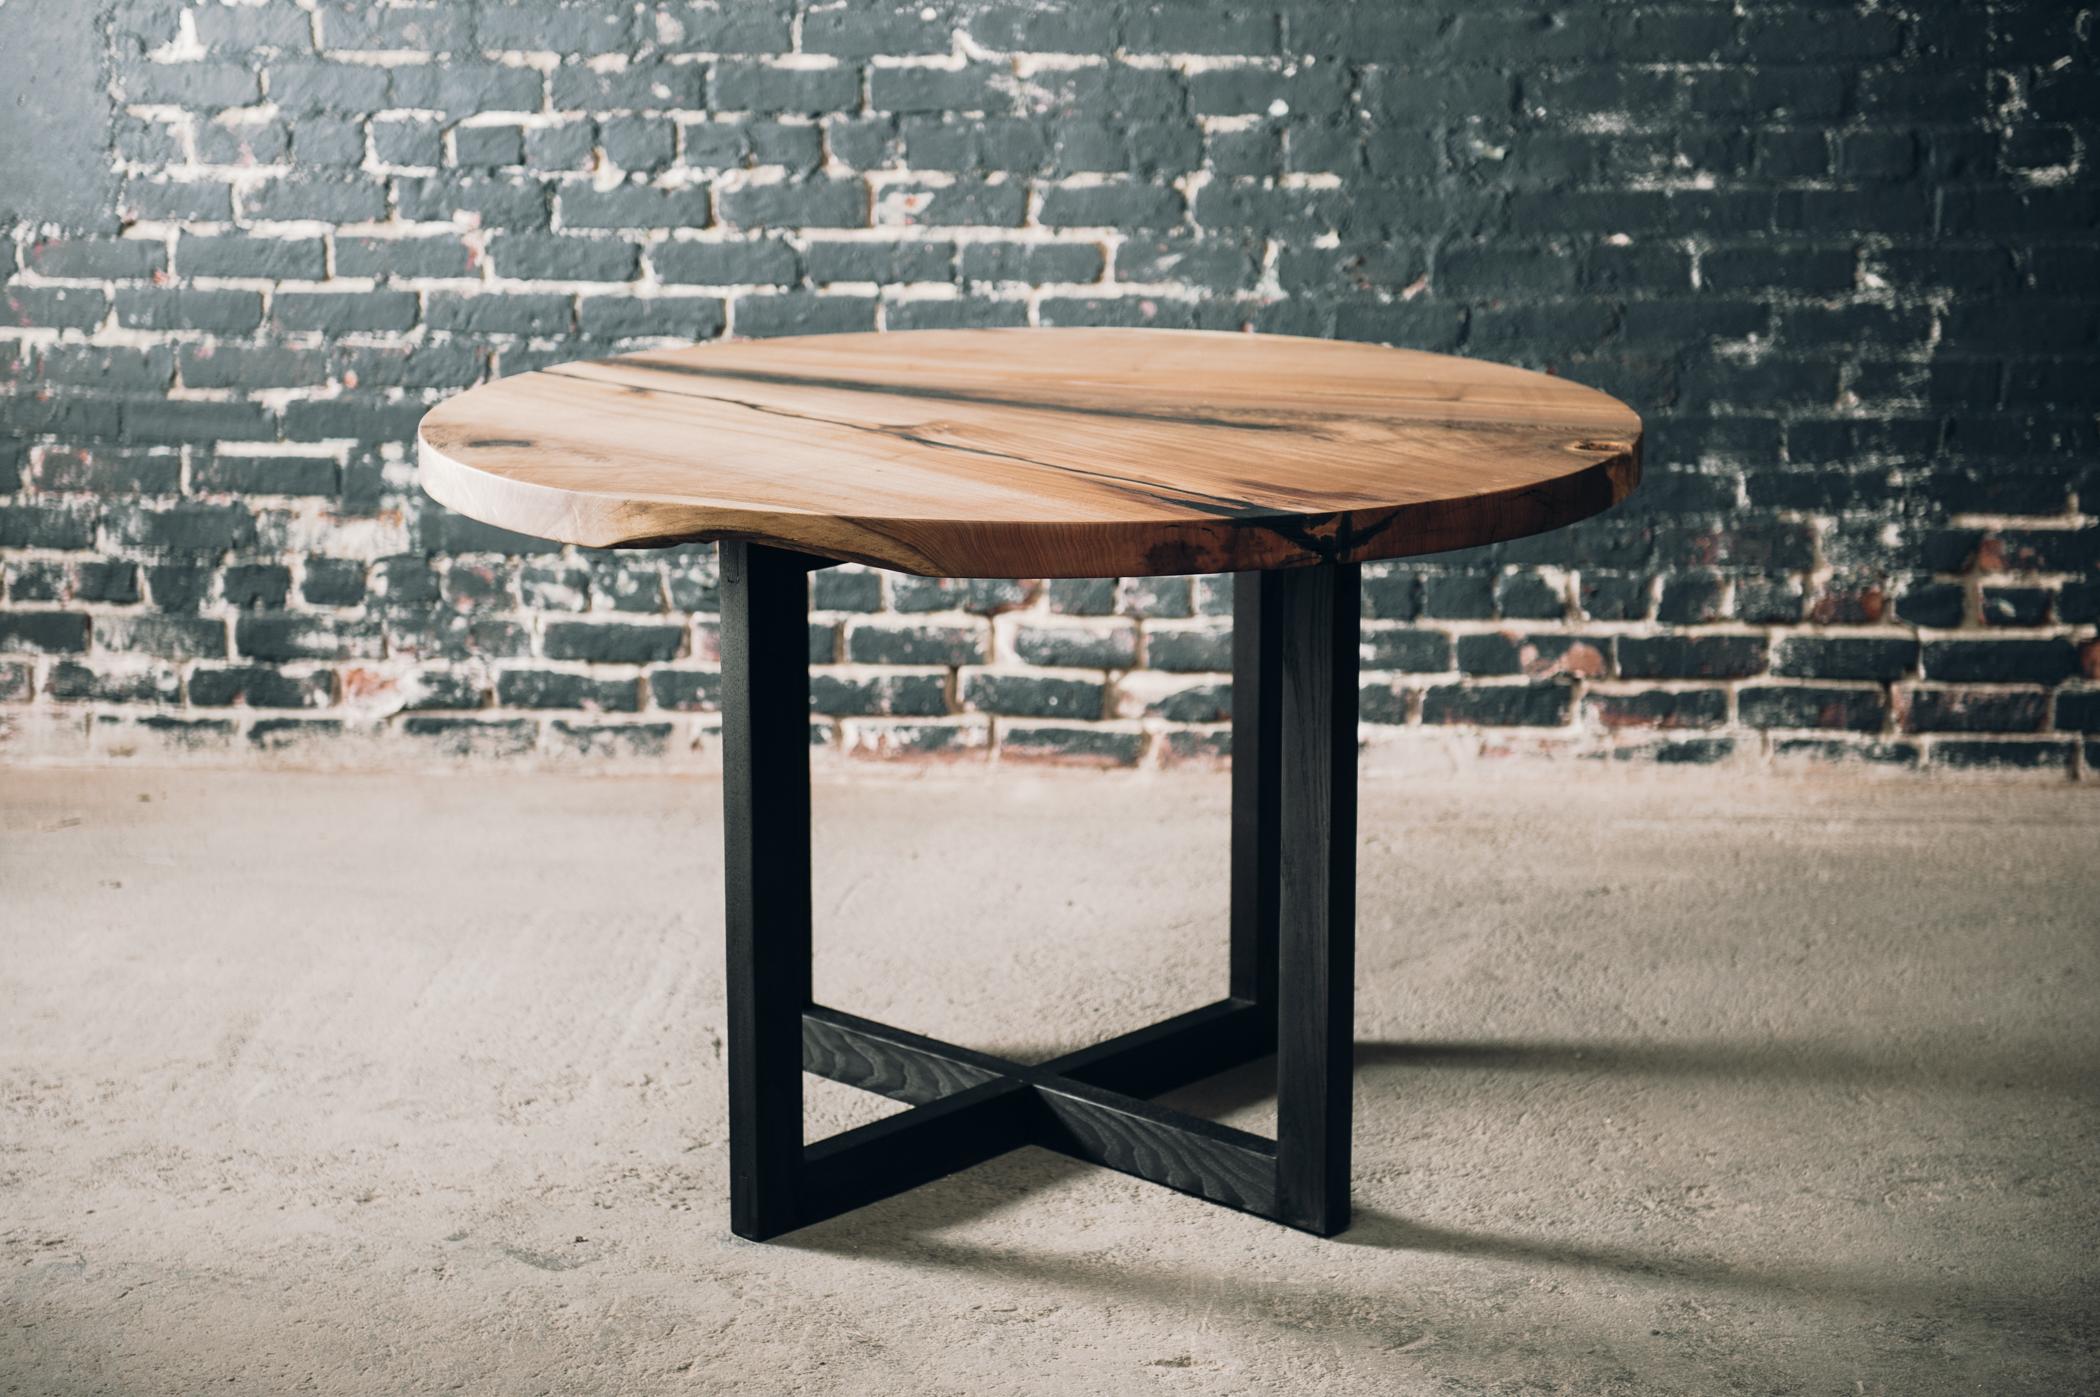 Pith_Round _Tables_DSC9787.jpg